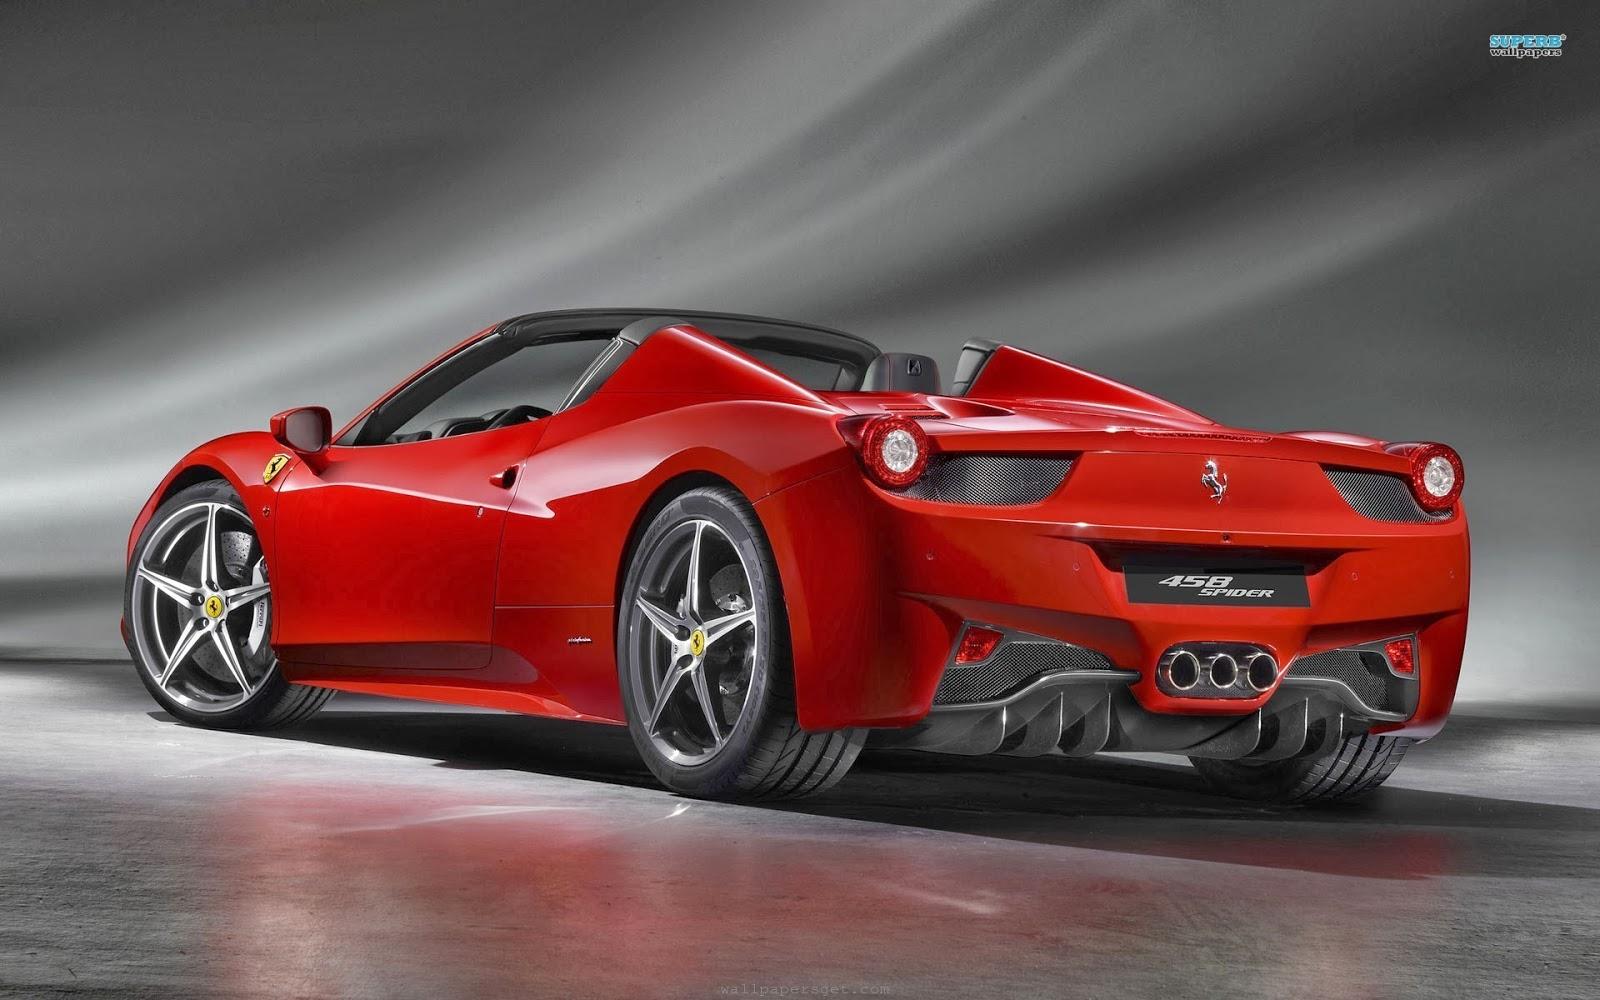 HD Wallpapers Ferrari 458 Italia Wallpapers 1600x1000